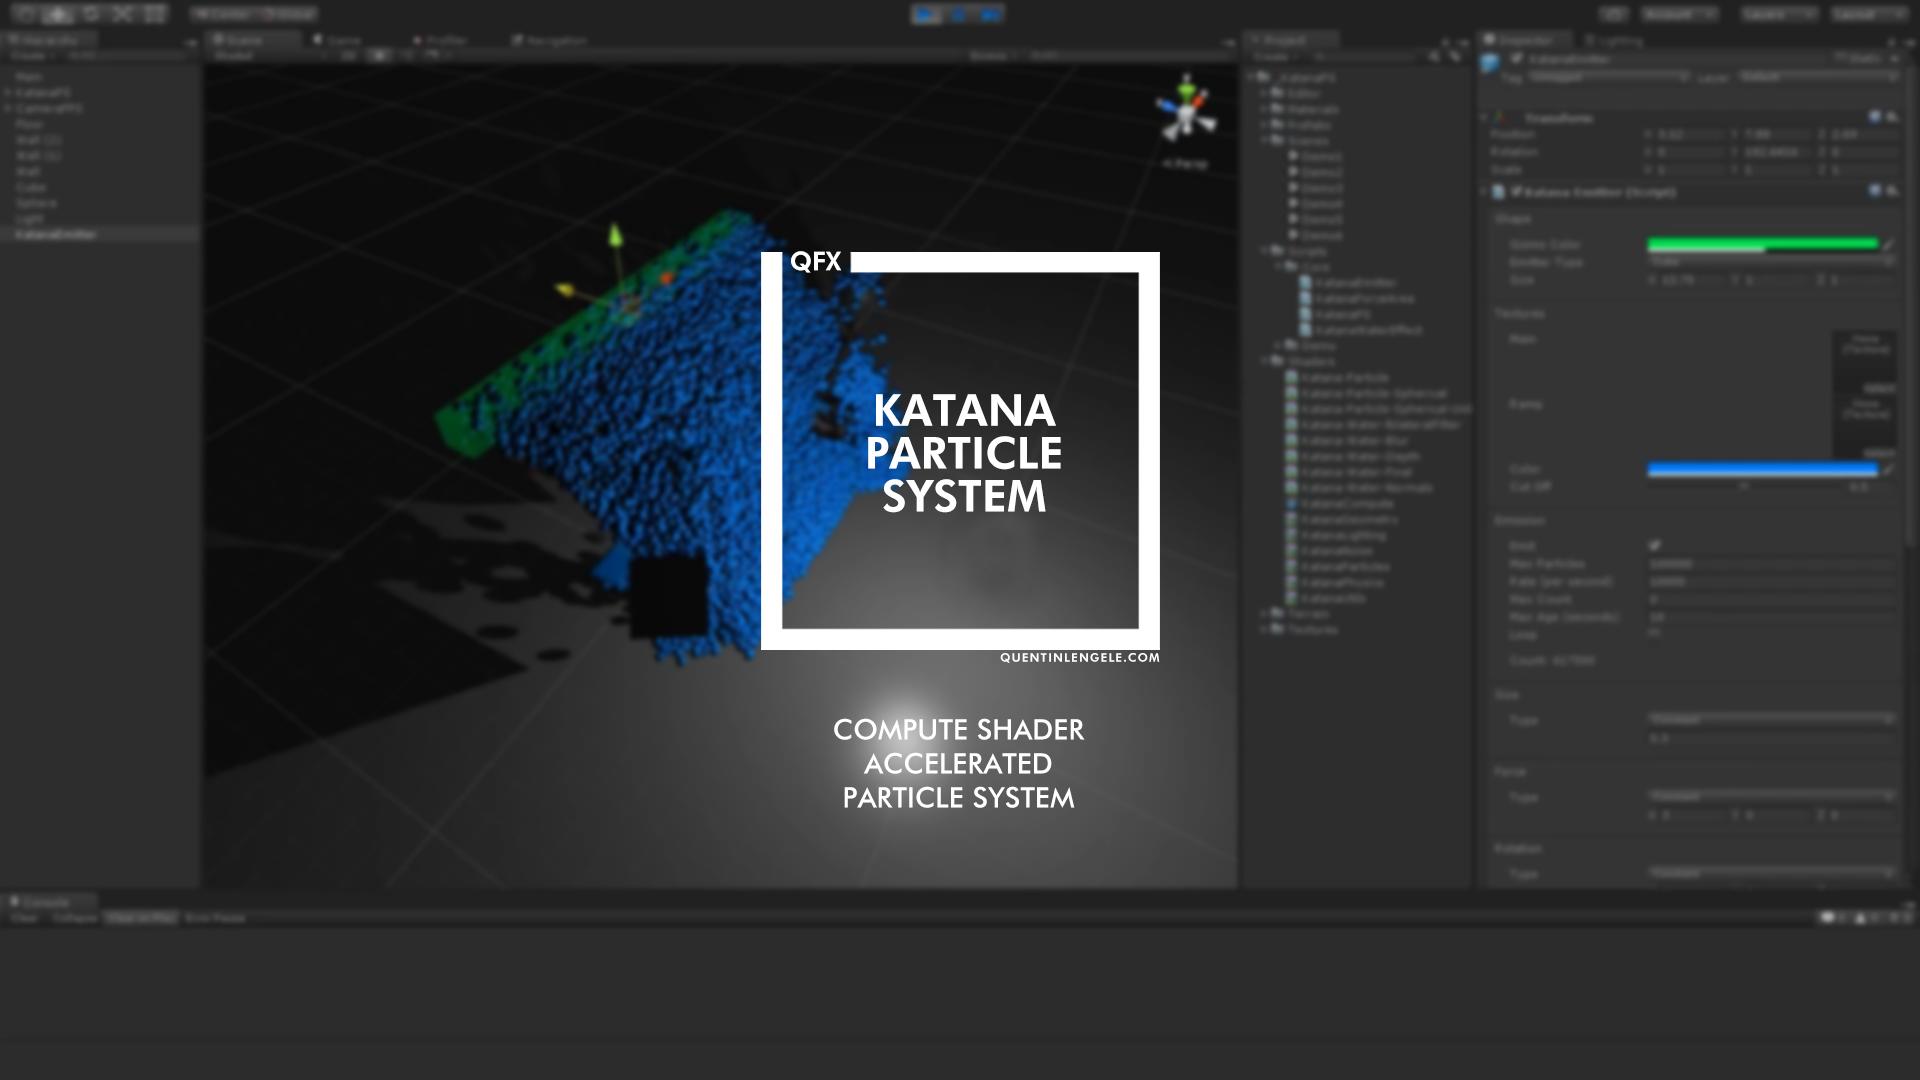 Katana Particle System